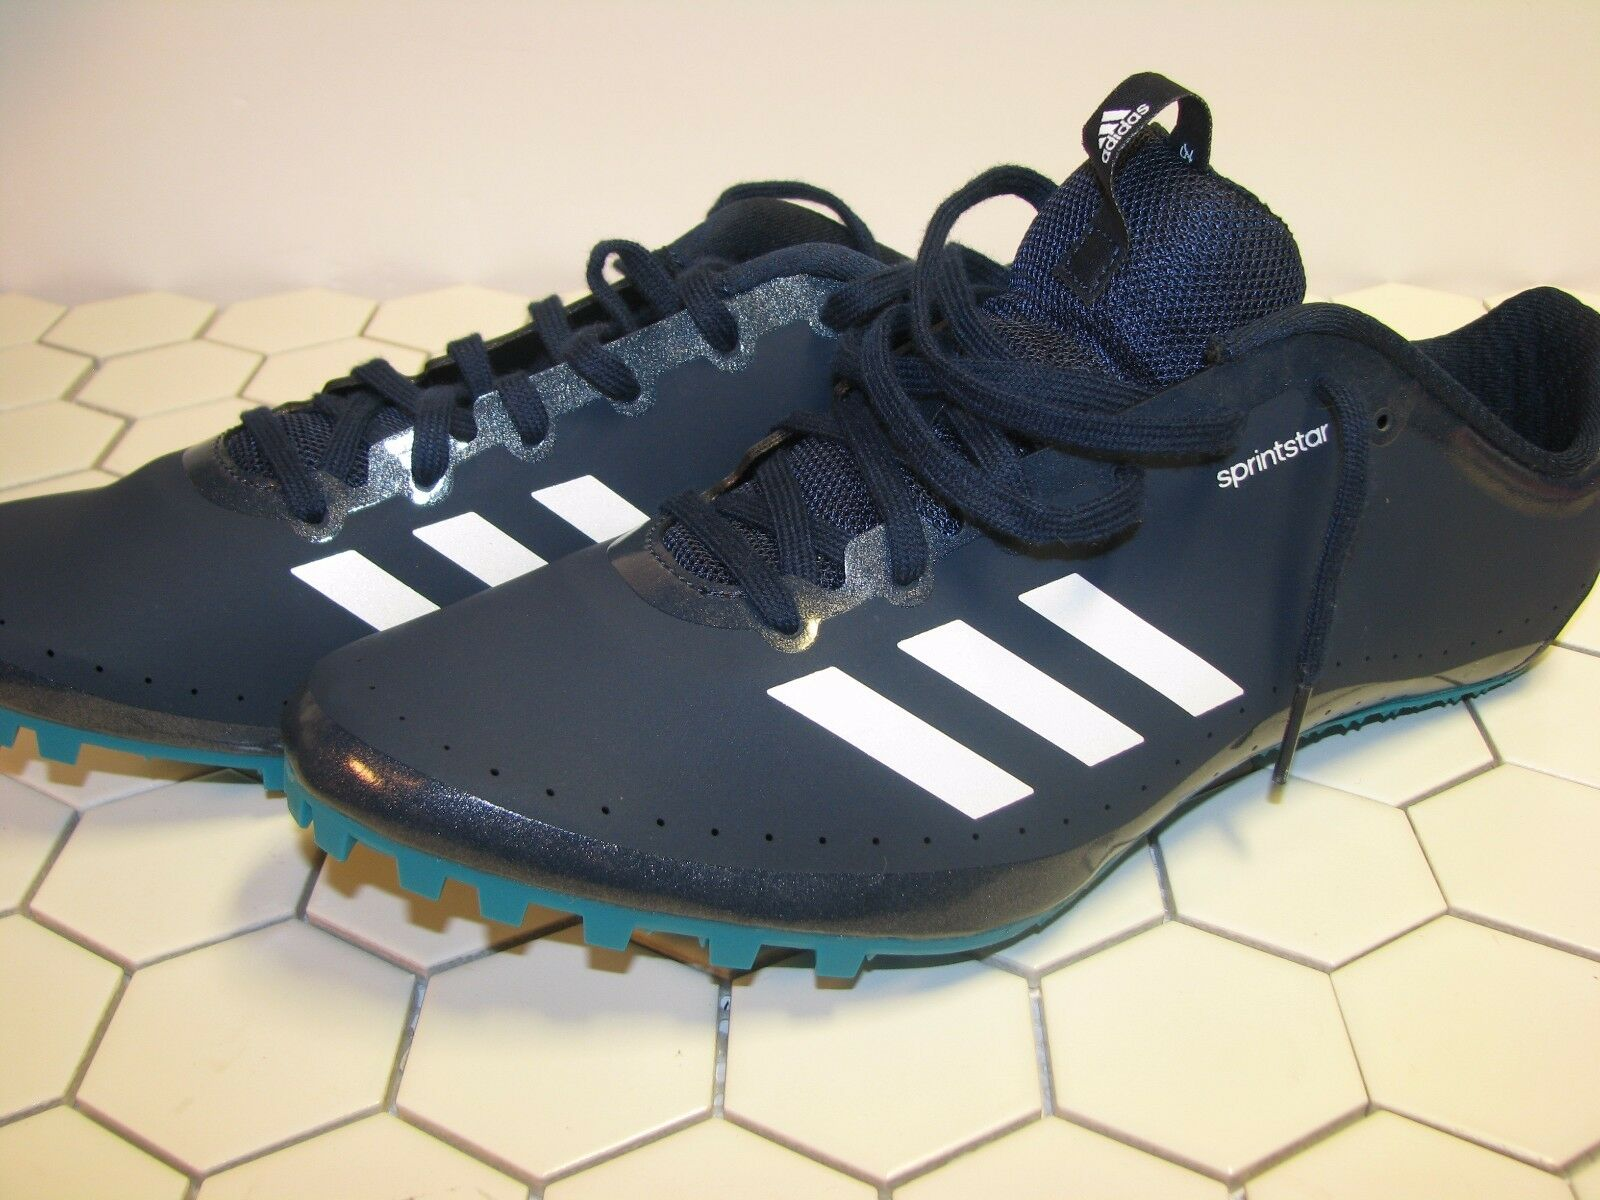 Men's adidas running sprintstar shoes Price reduction Great discount